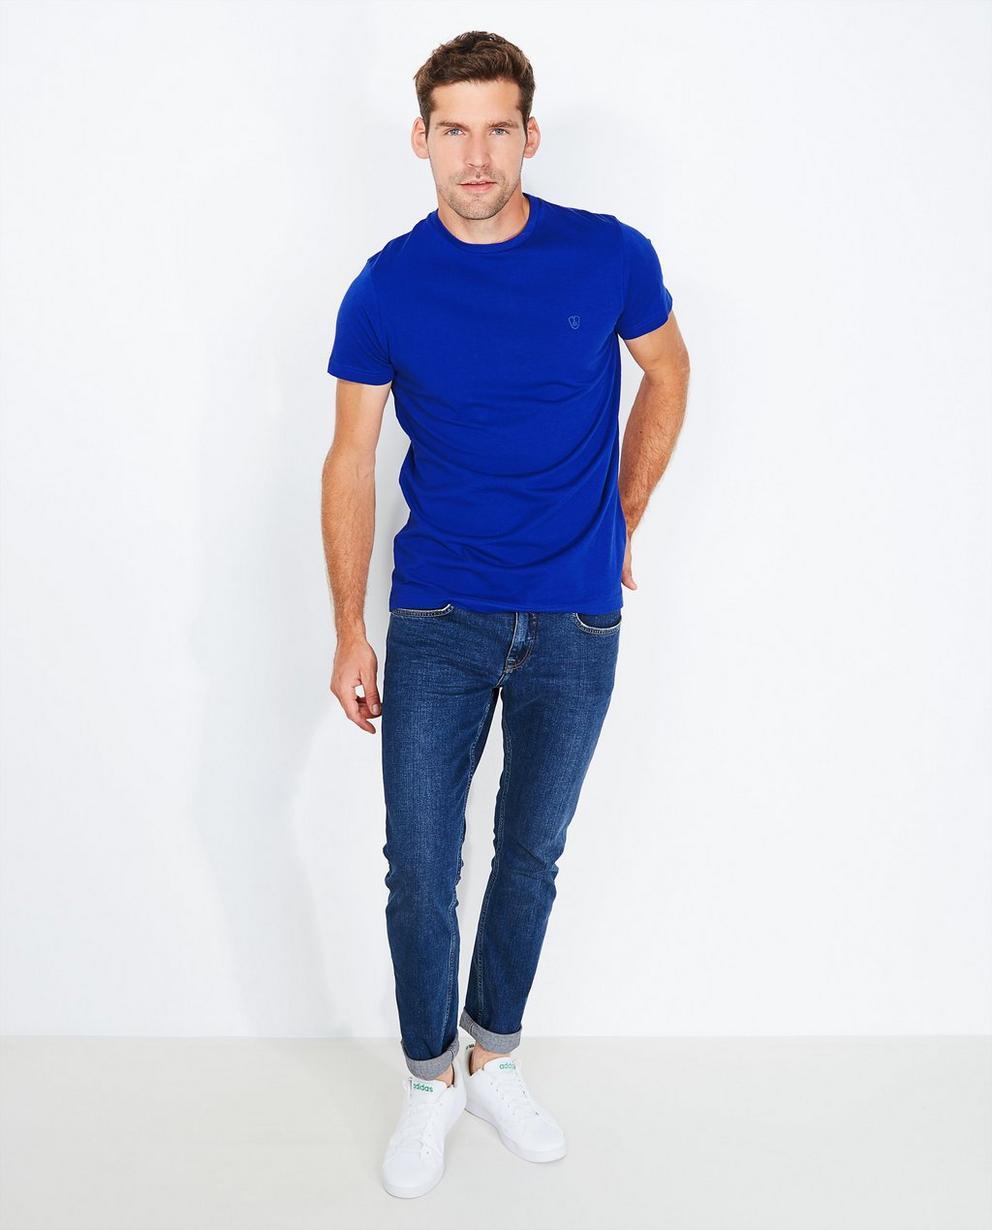 Bordeauxrood T-shirt, comfort fit - null - Tim Moore